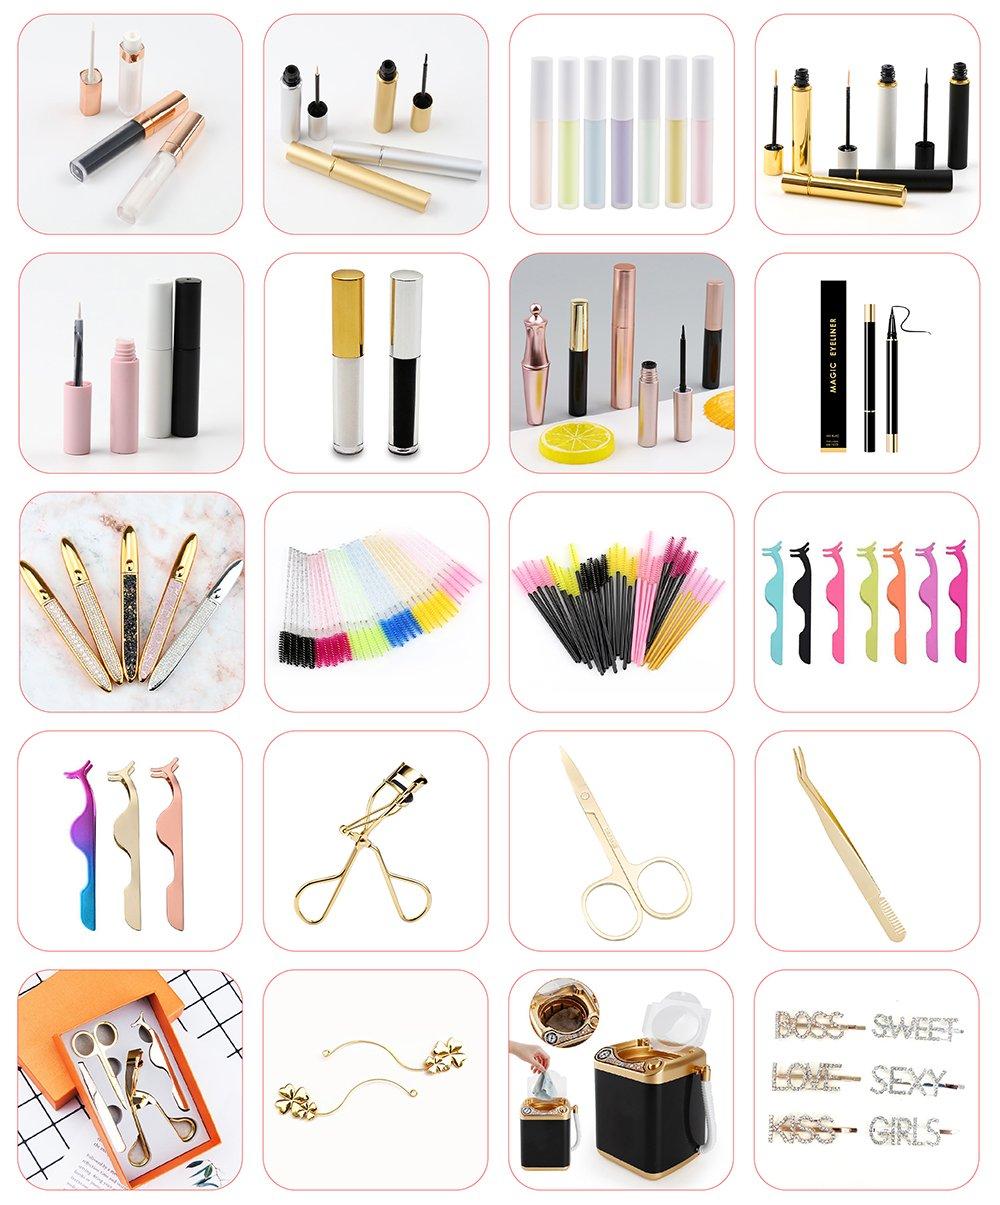 Lash-tools-1000.jpg